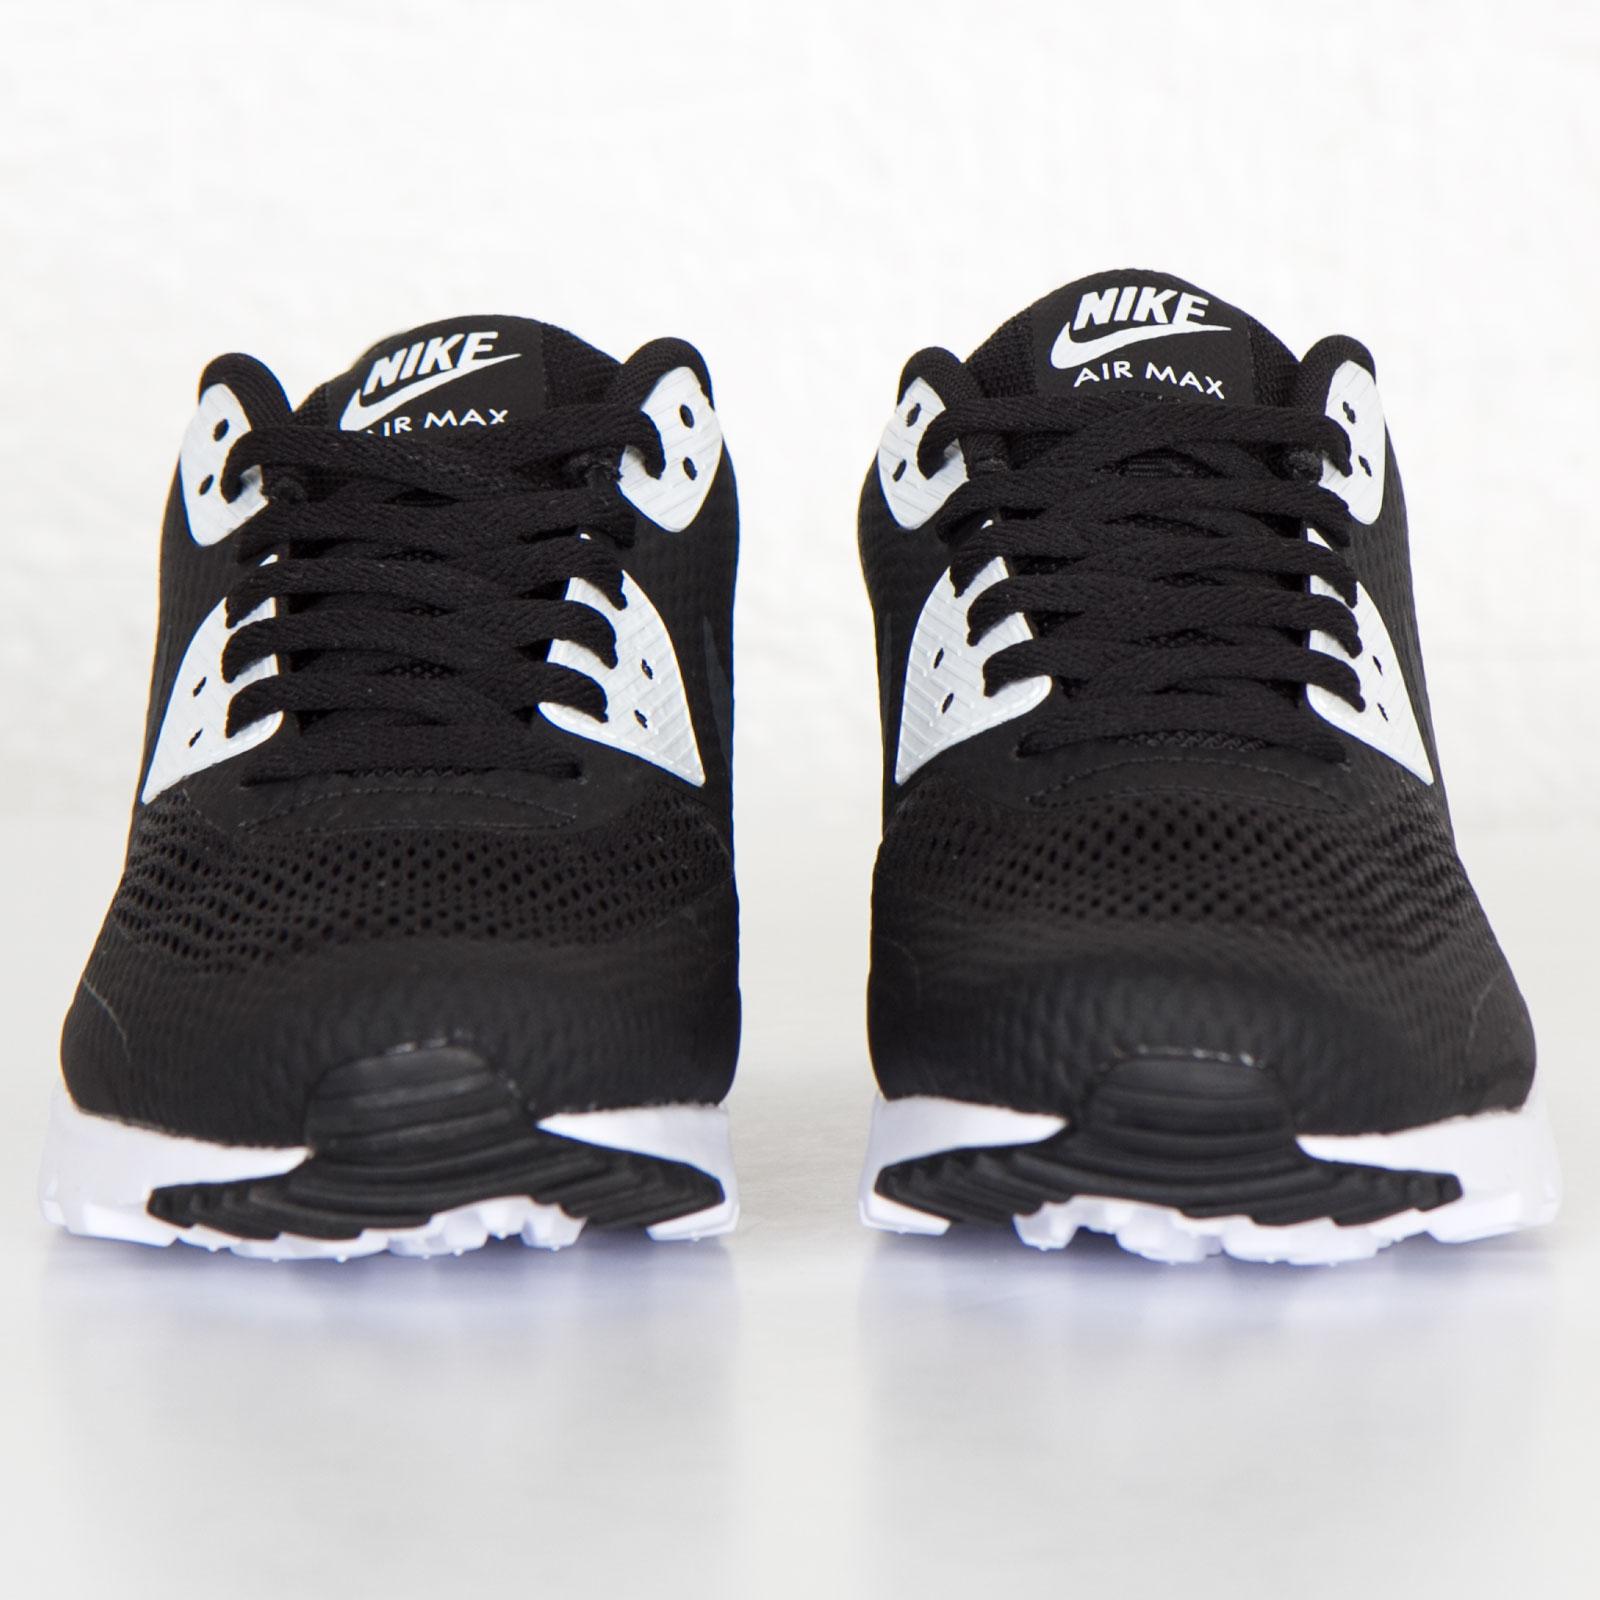 best cheap 7f9b3 e8185 Nike Air Max 90 Ultra Essential - 819474-001 - Sneakersnstuff   sneakers    streetwear online since 1999